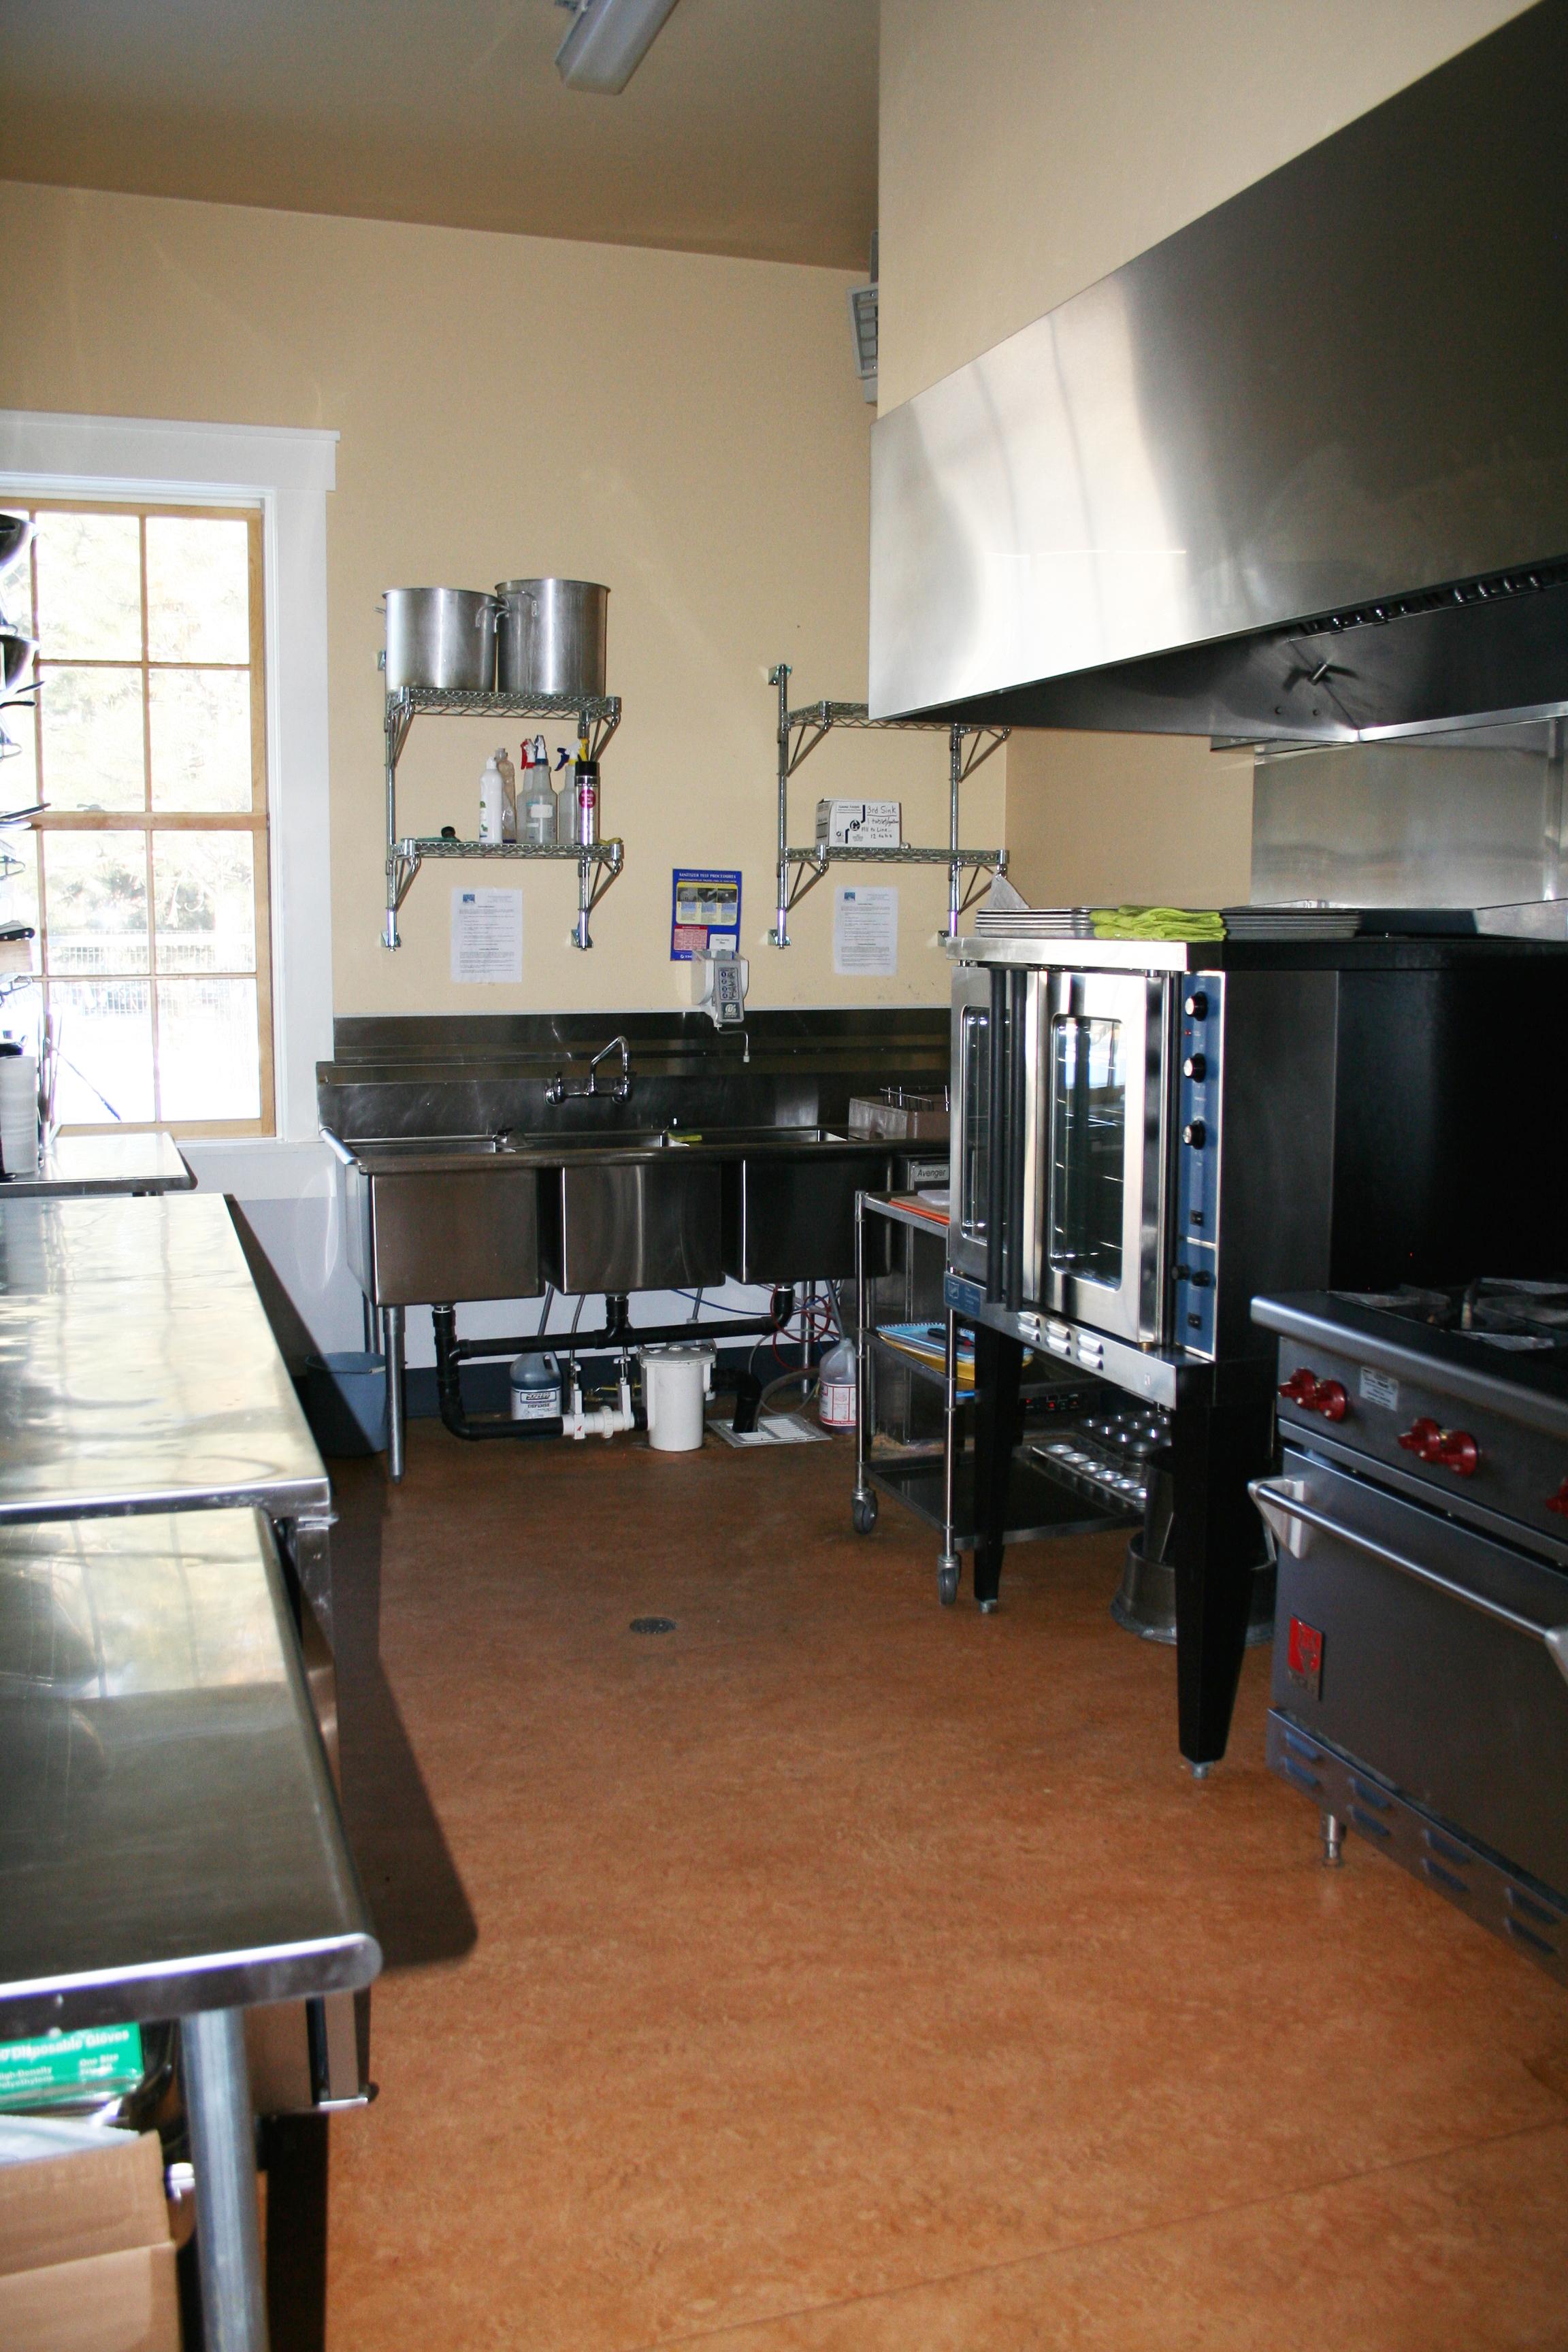 The OWSCC Kitchen